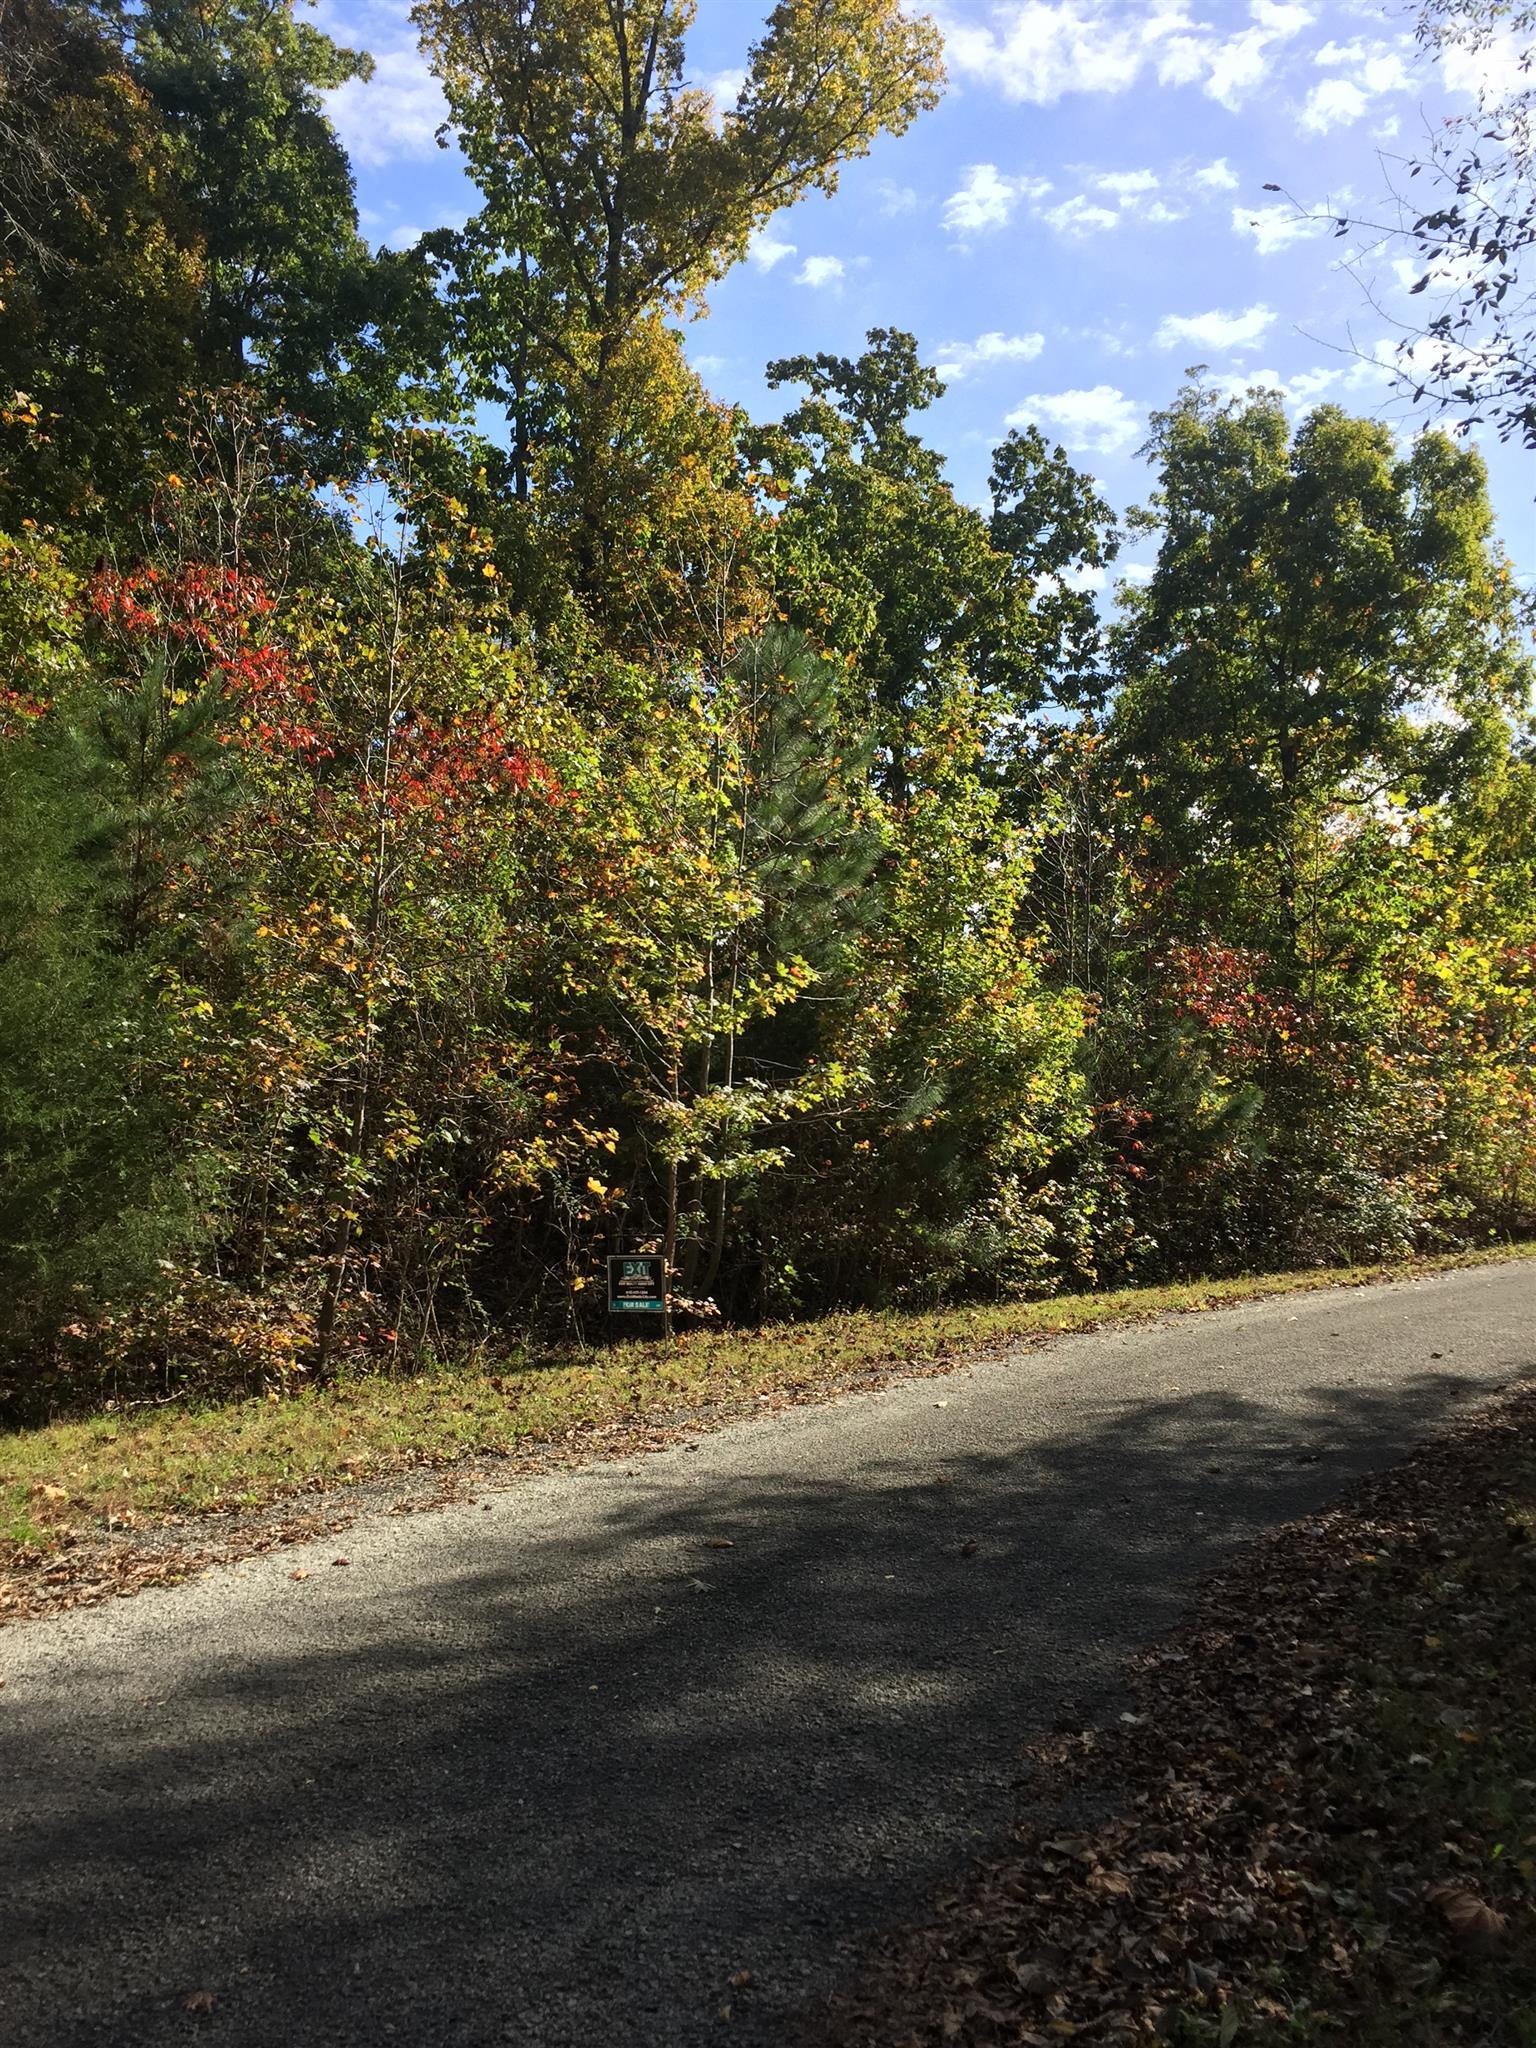 0 Links Bend Way, Springville, TN 38256 - Springville, TN real estate listing